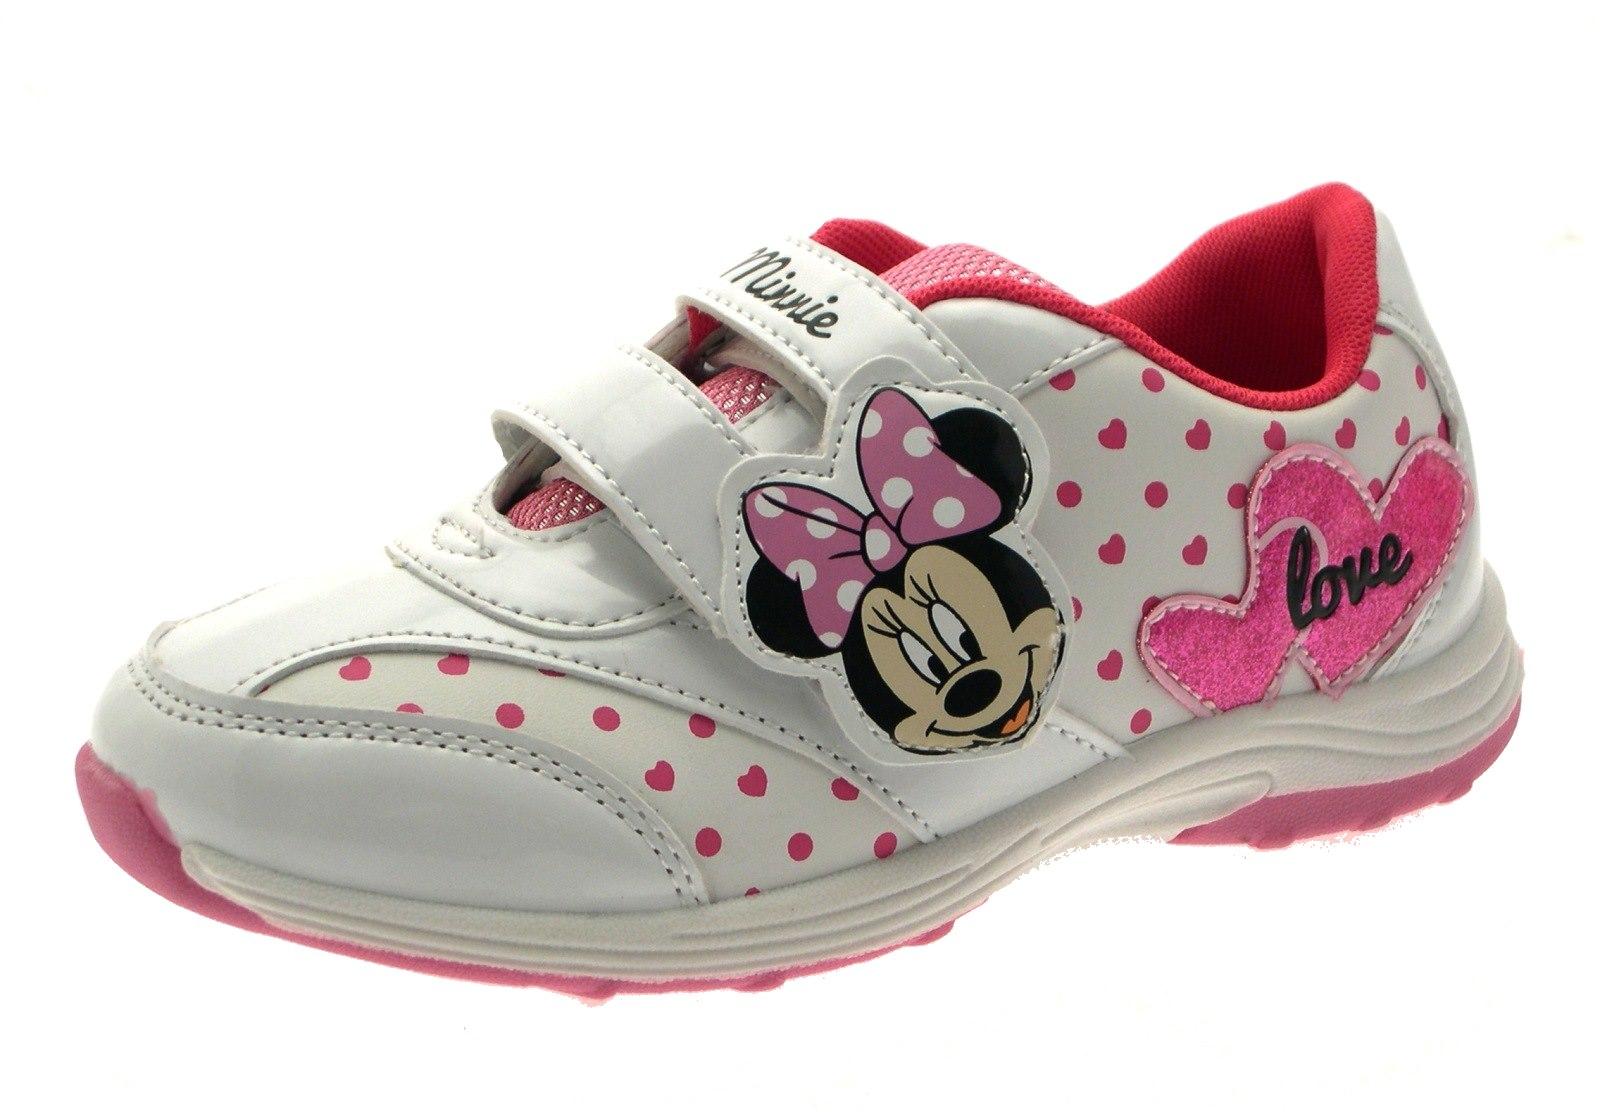 6e5a934af9d8 Minnie Mouse Girls Canvas Pumps Boots Trainers Slippers Clogs Kids ...